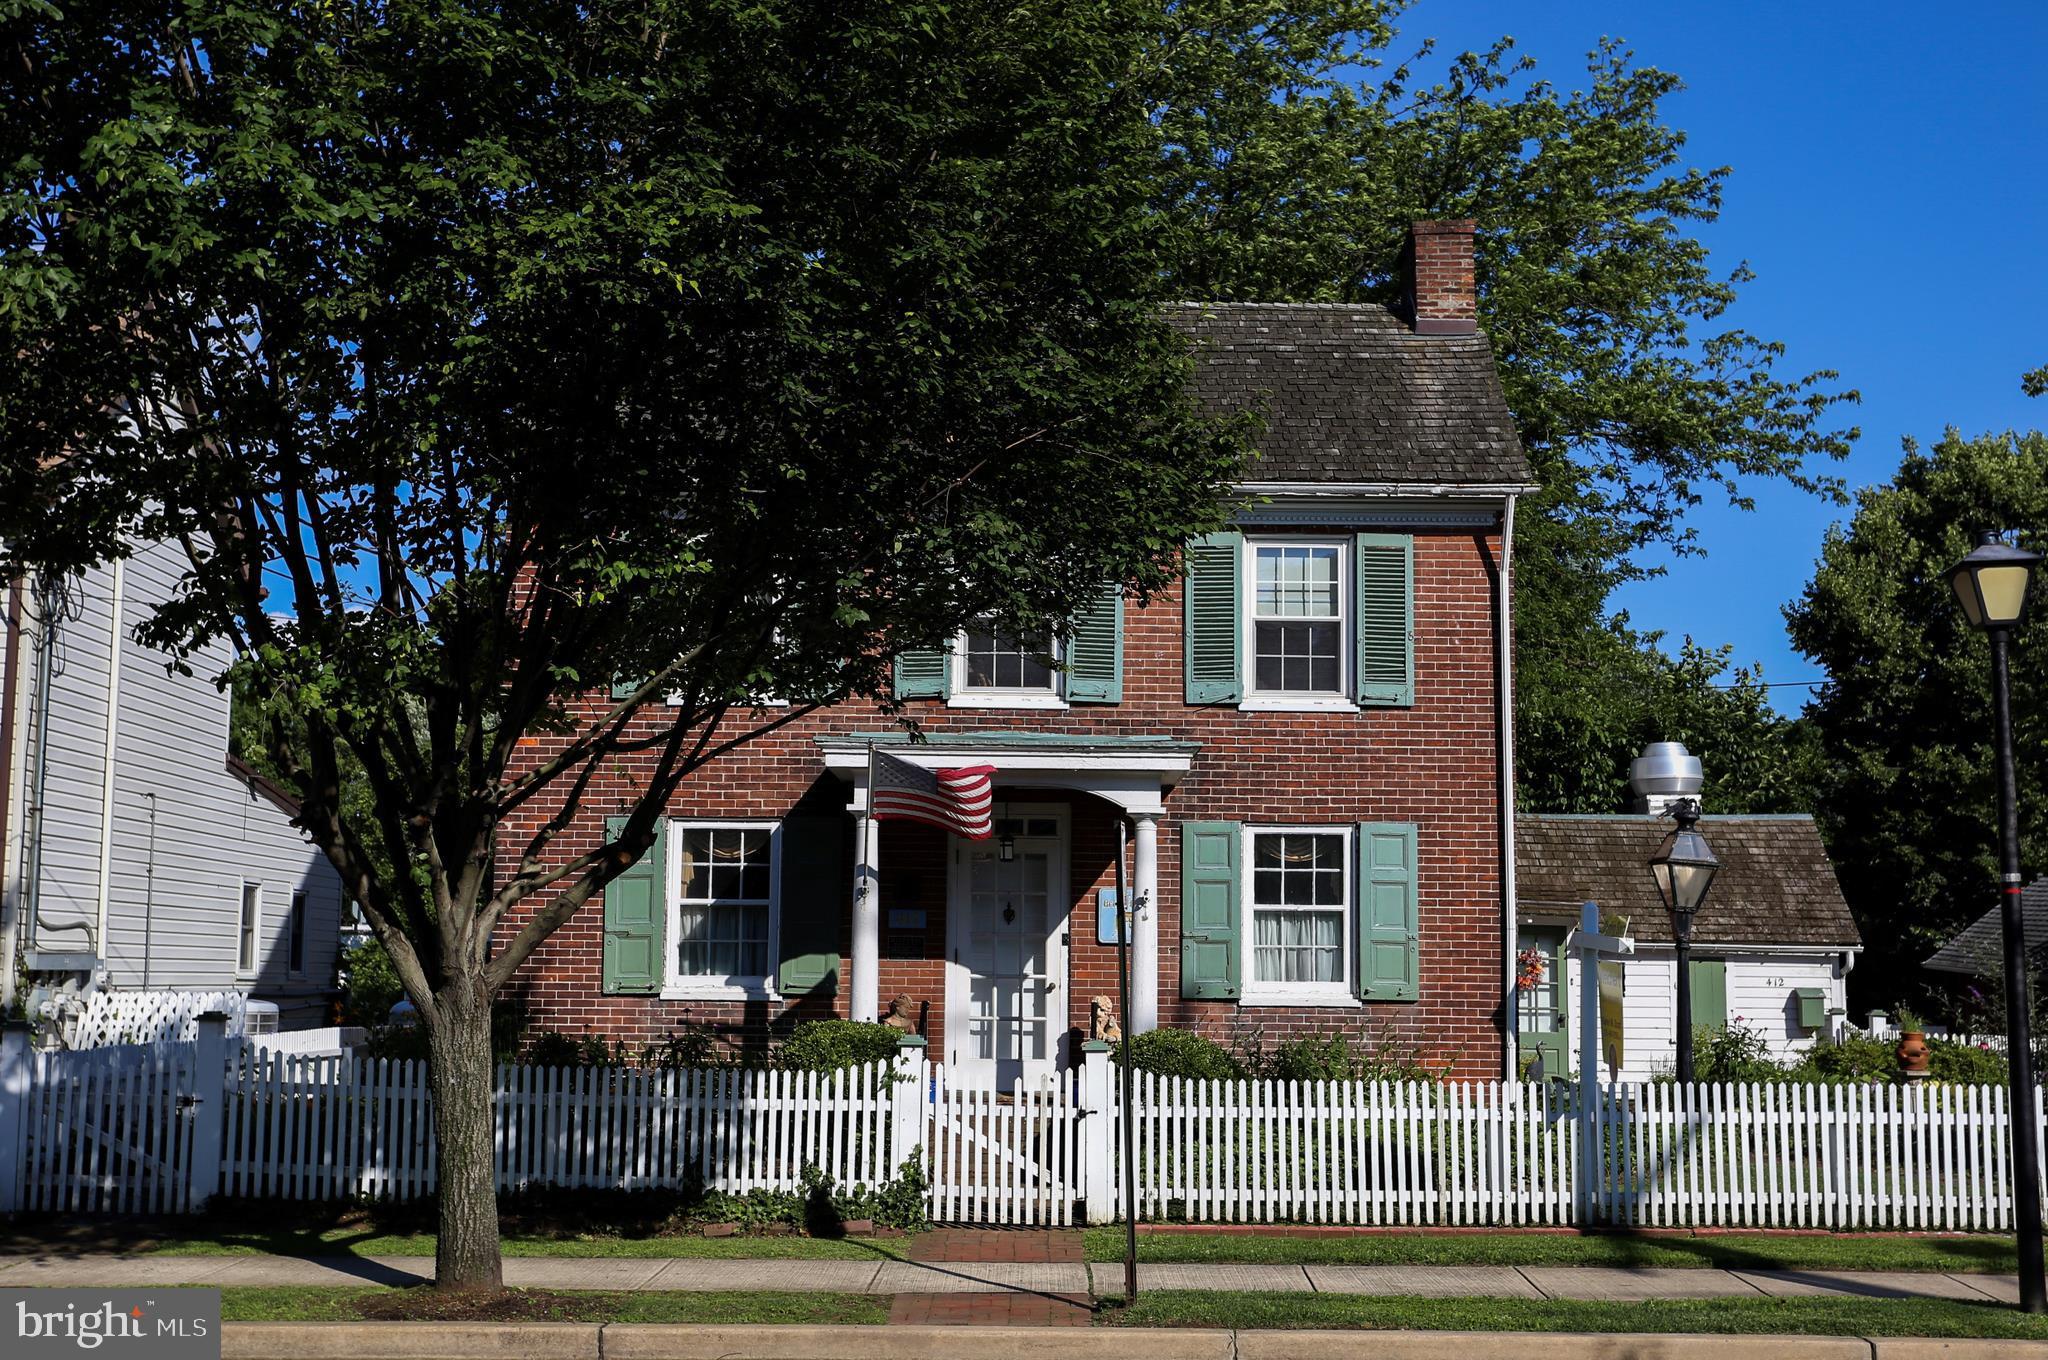 412 MAIN STREET, BRISTOL, PA 19007